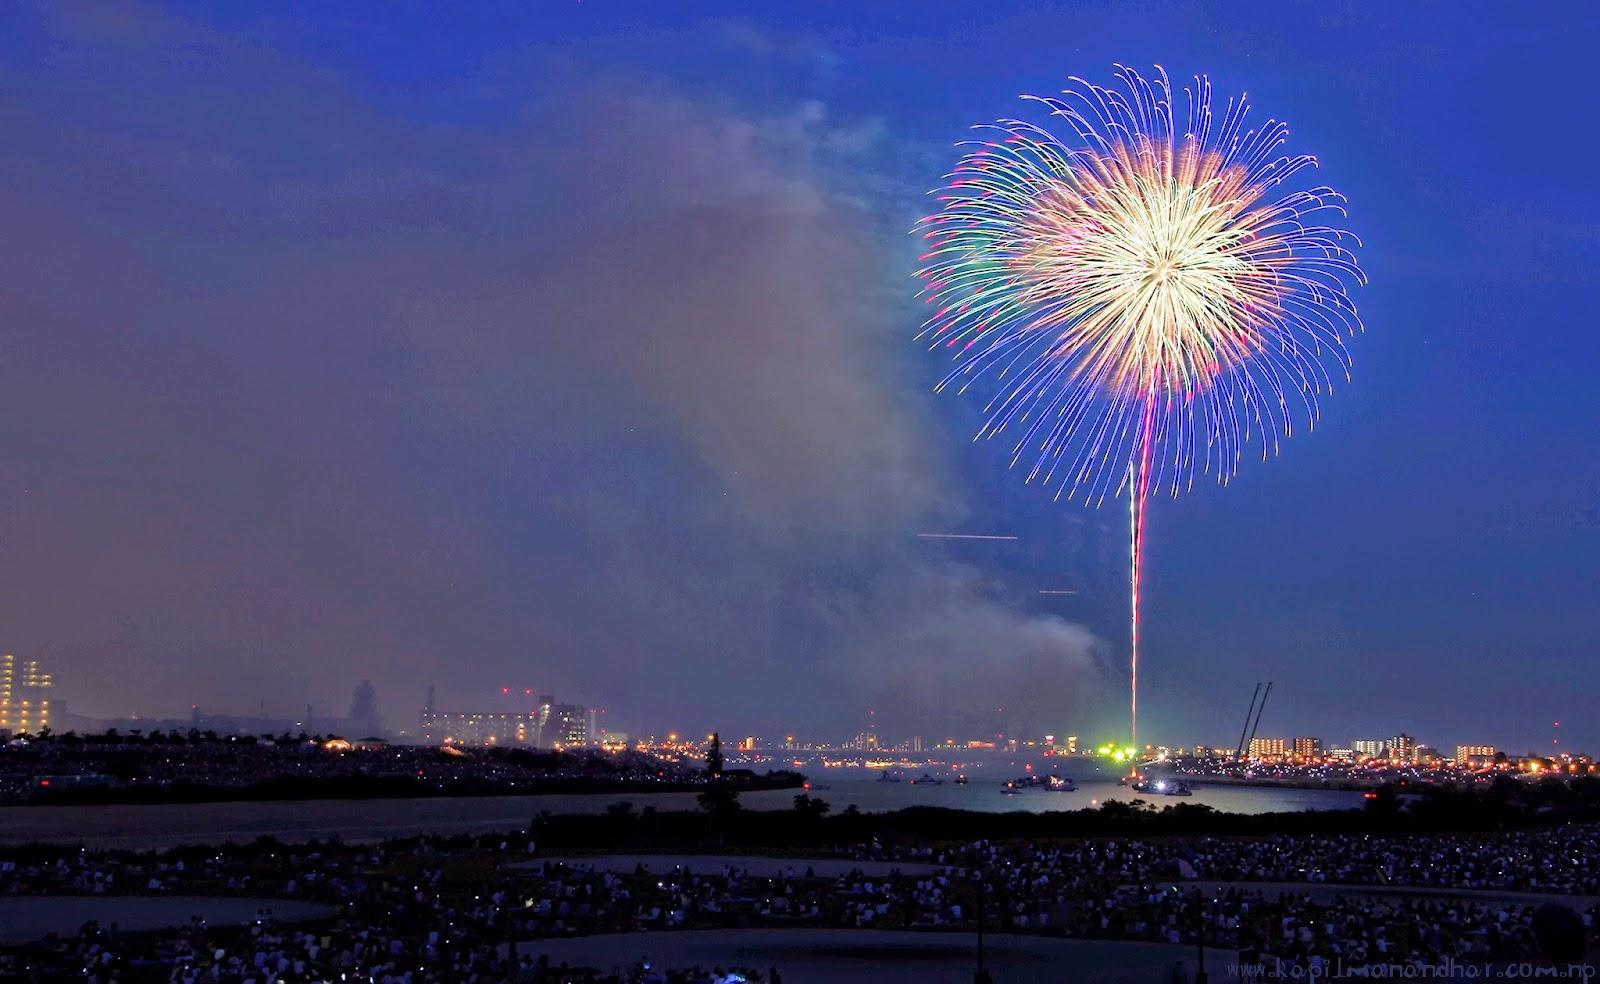 Fireworks Tokyo Edogawa 2014 花火大会 江戸川2014